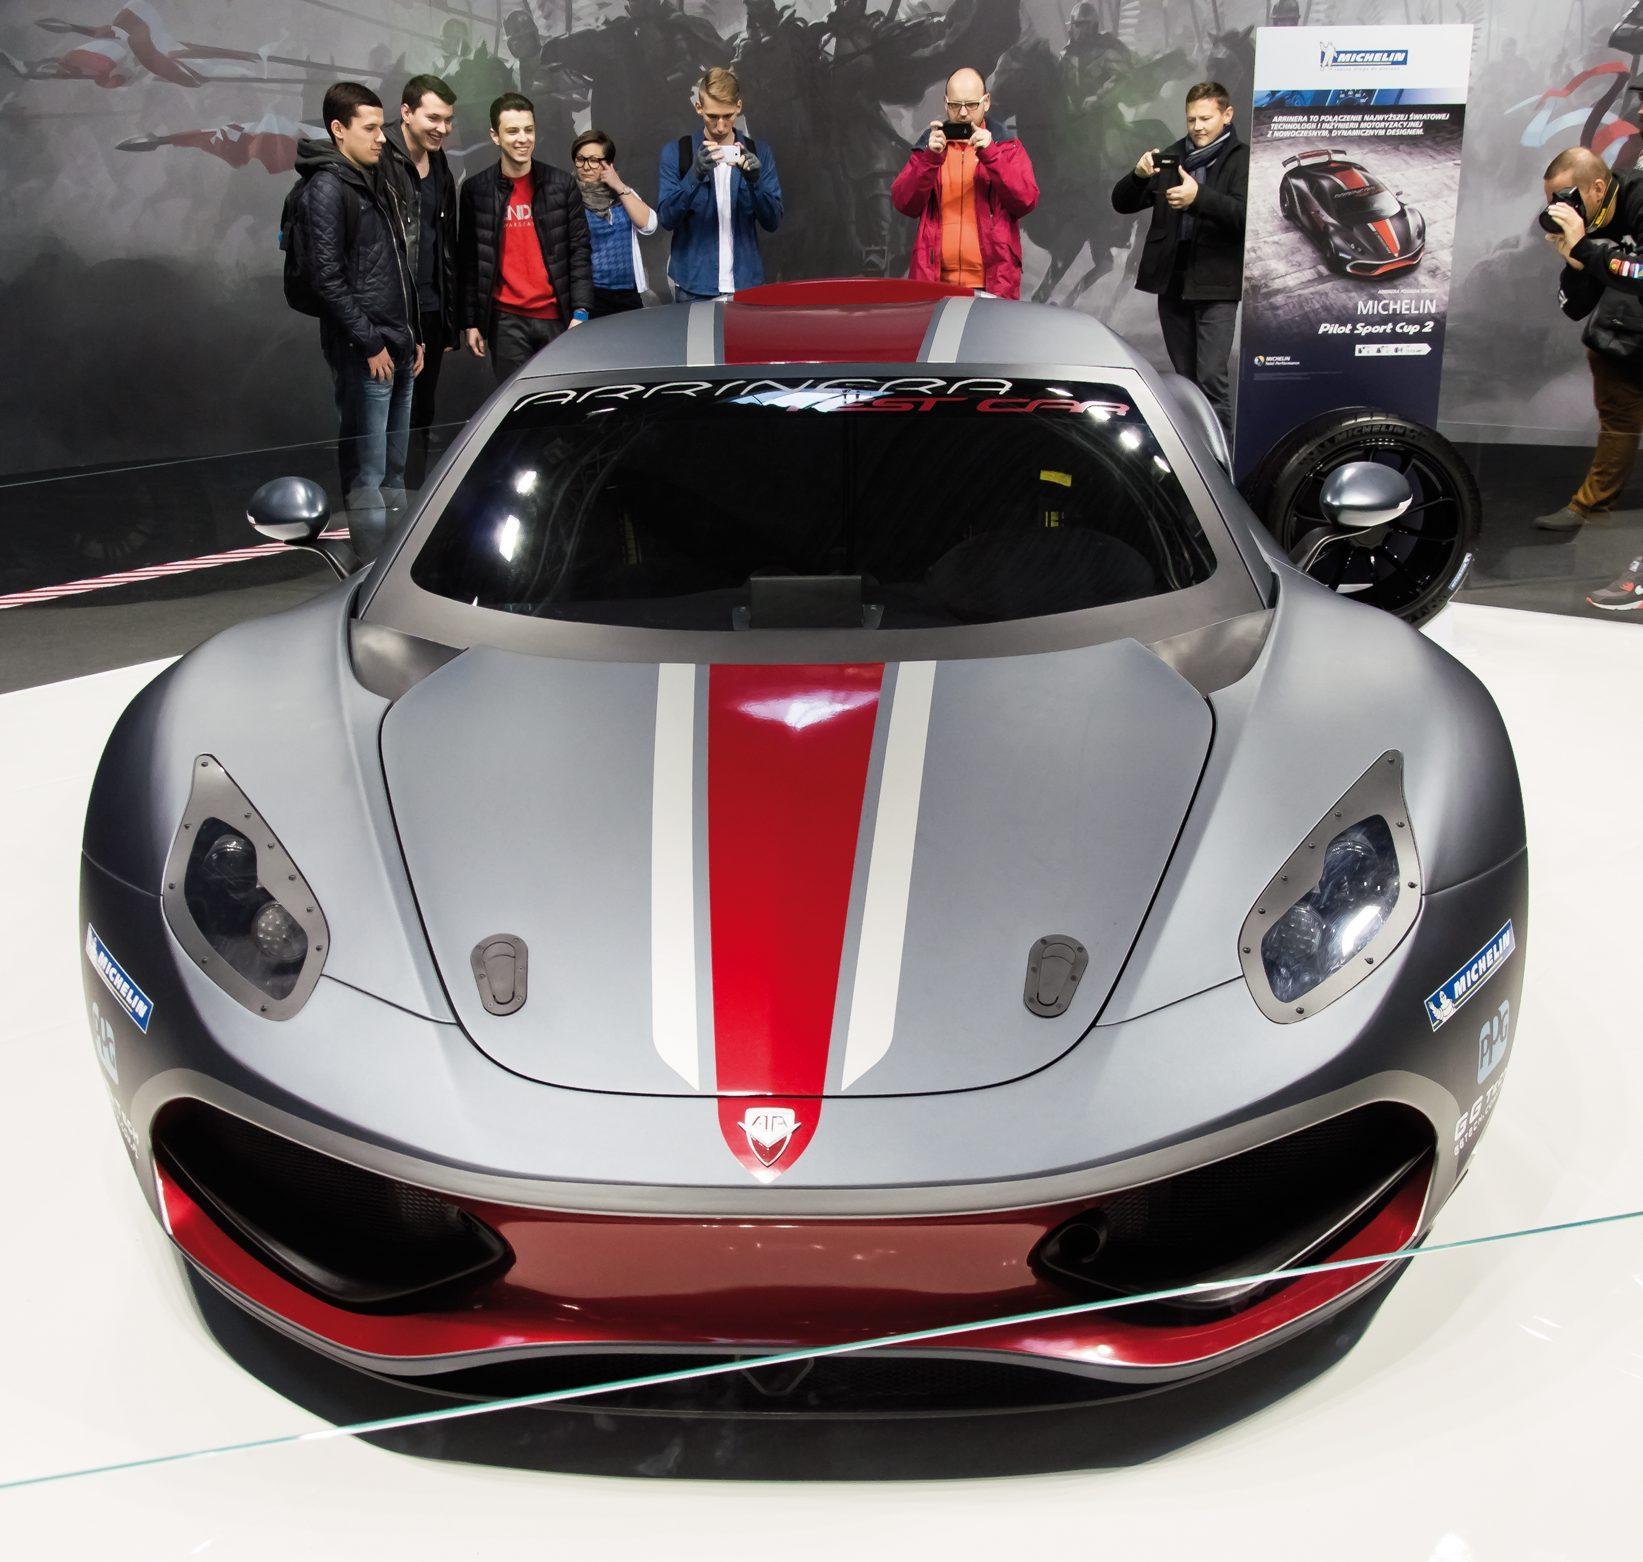 Warsaw Moto Show 2015